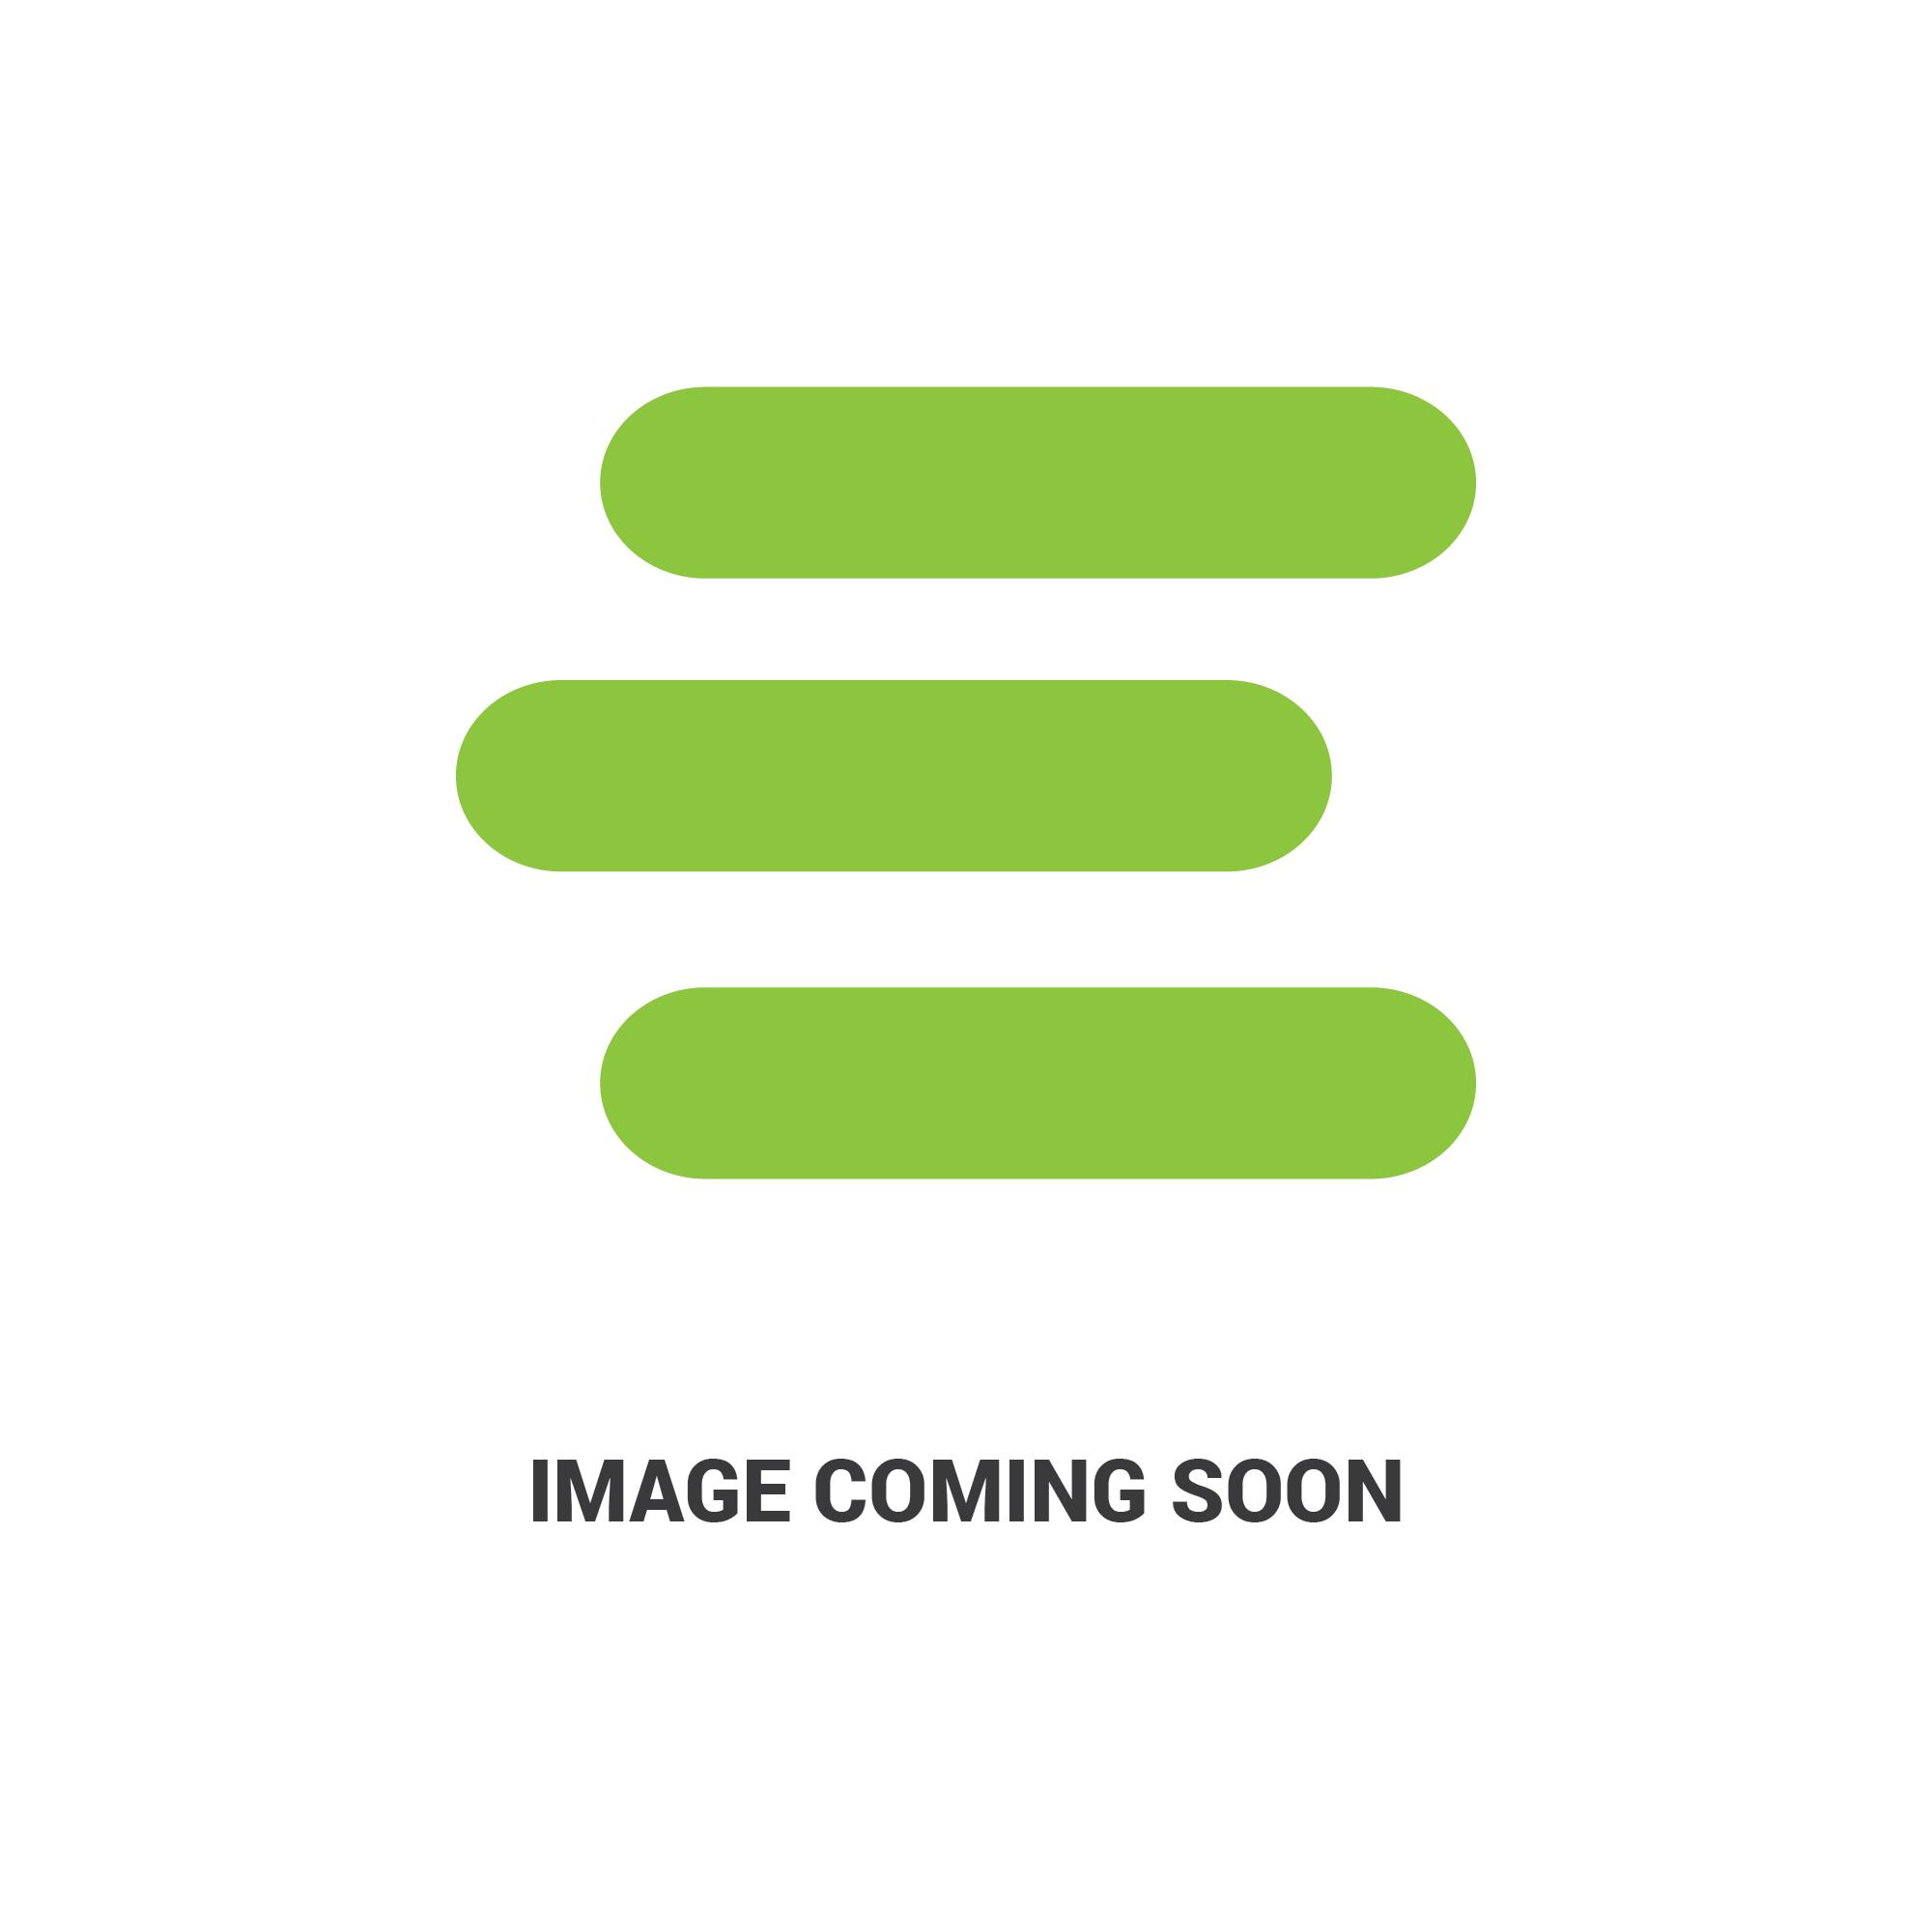 E-204656edit 1.jpg